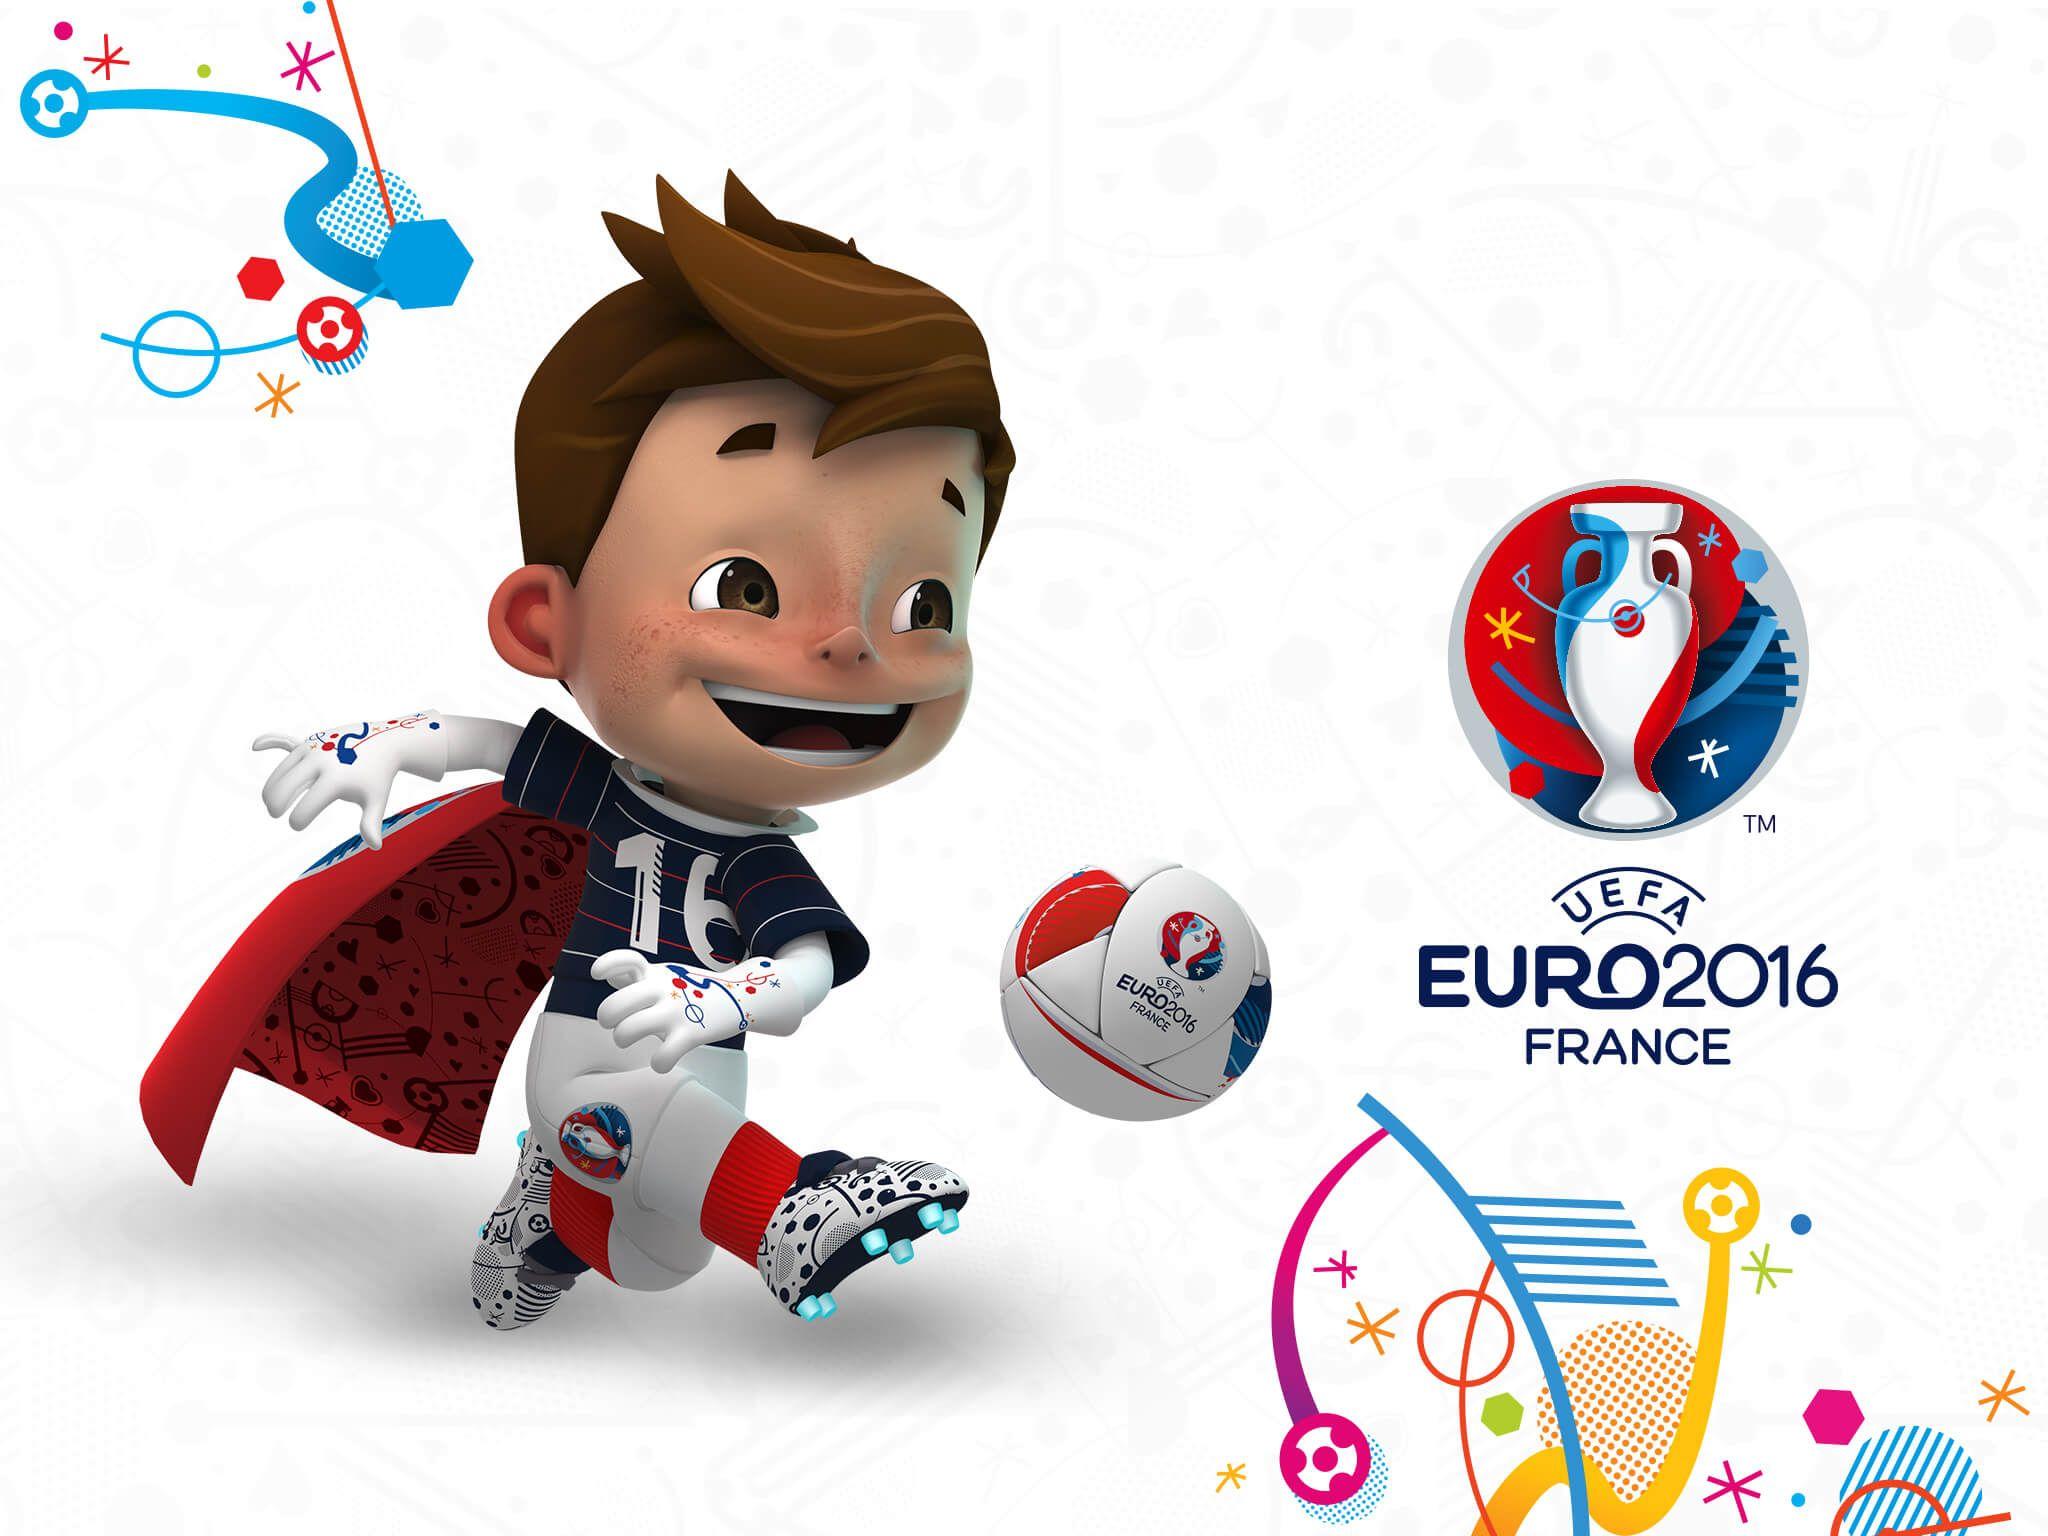 Uefa Euro 2016 Mascot was released on 18 Nov 2014. Till